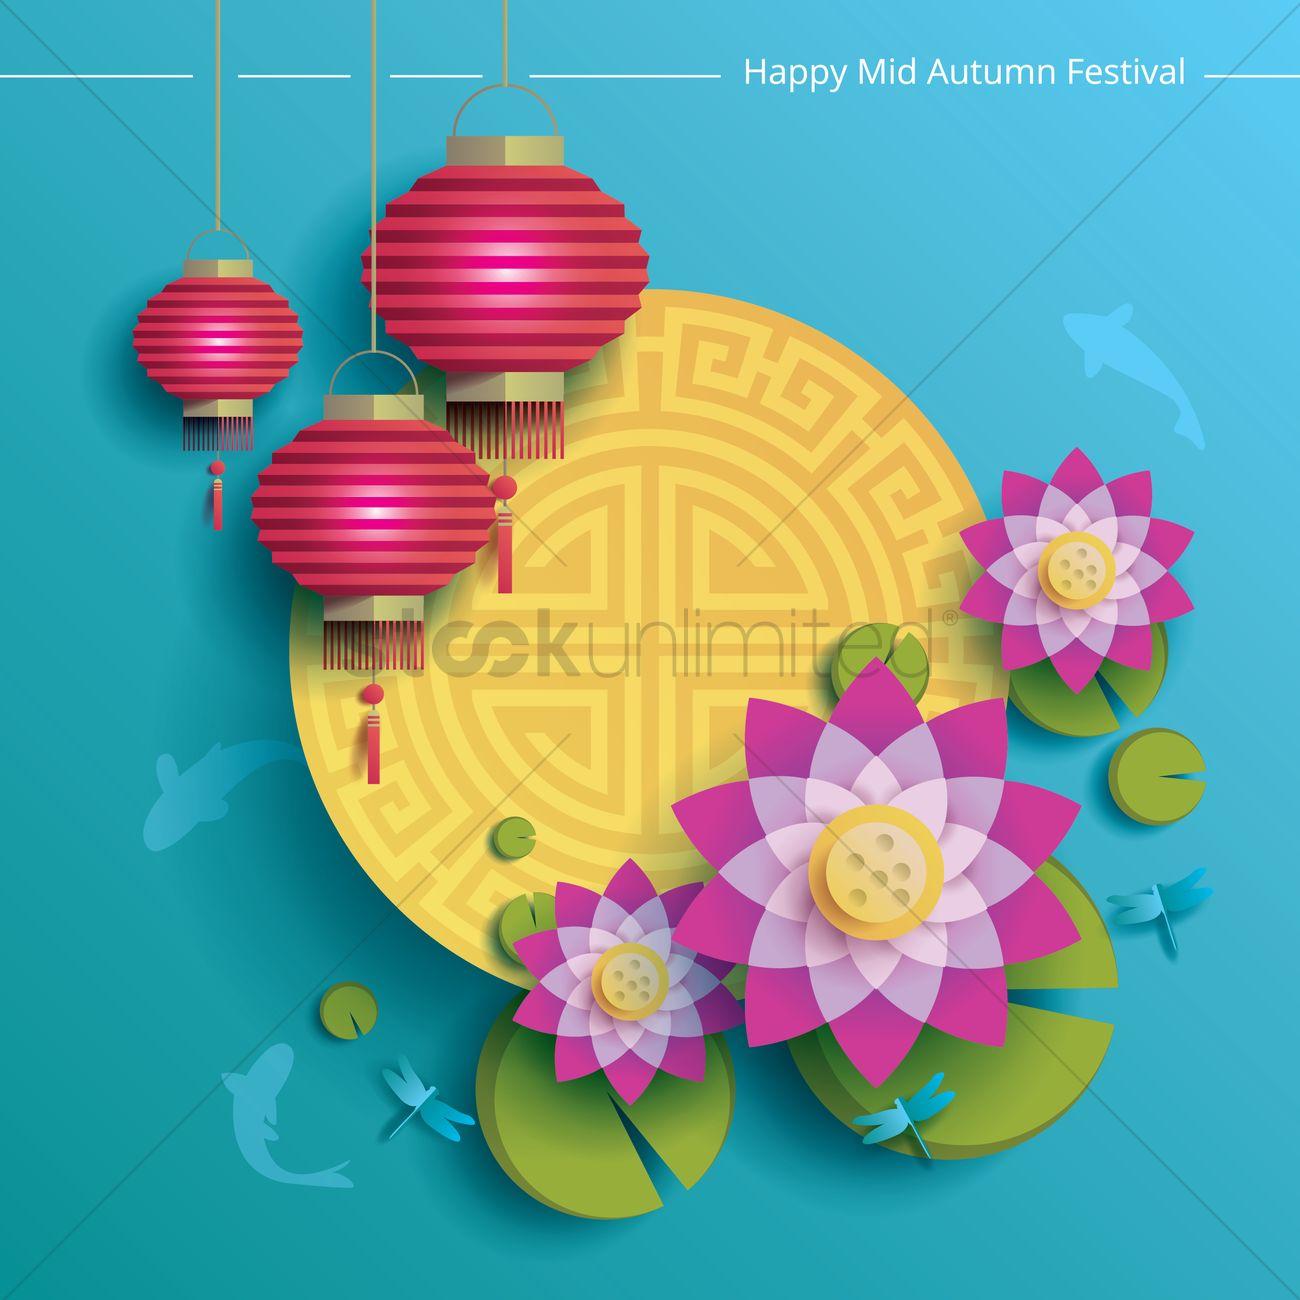 Happy mid autumn festival background vector image 1607575 happy mid autumn festival background vector graphic m4hsunfo